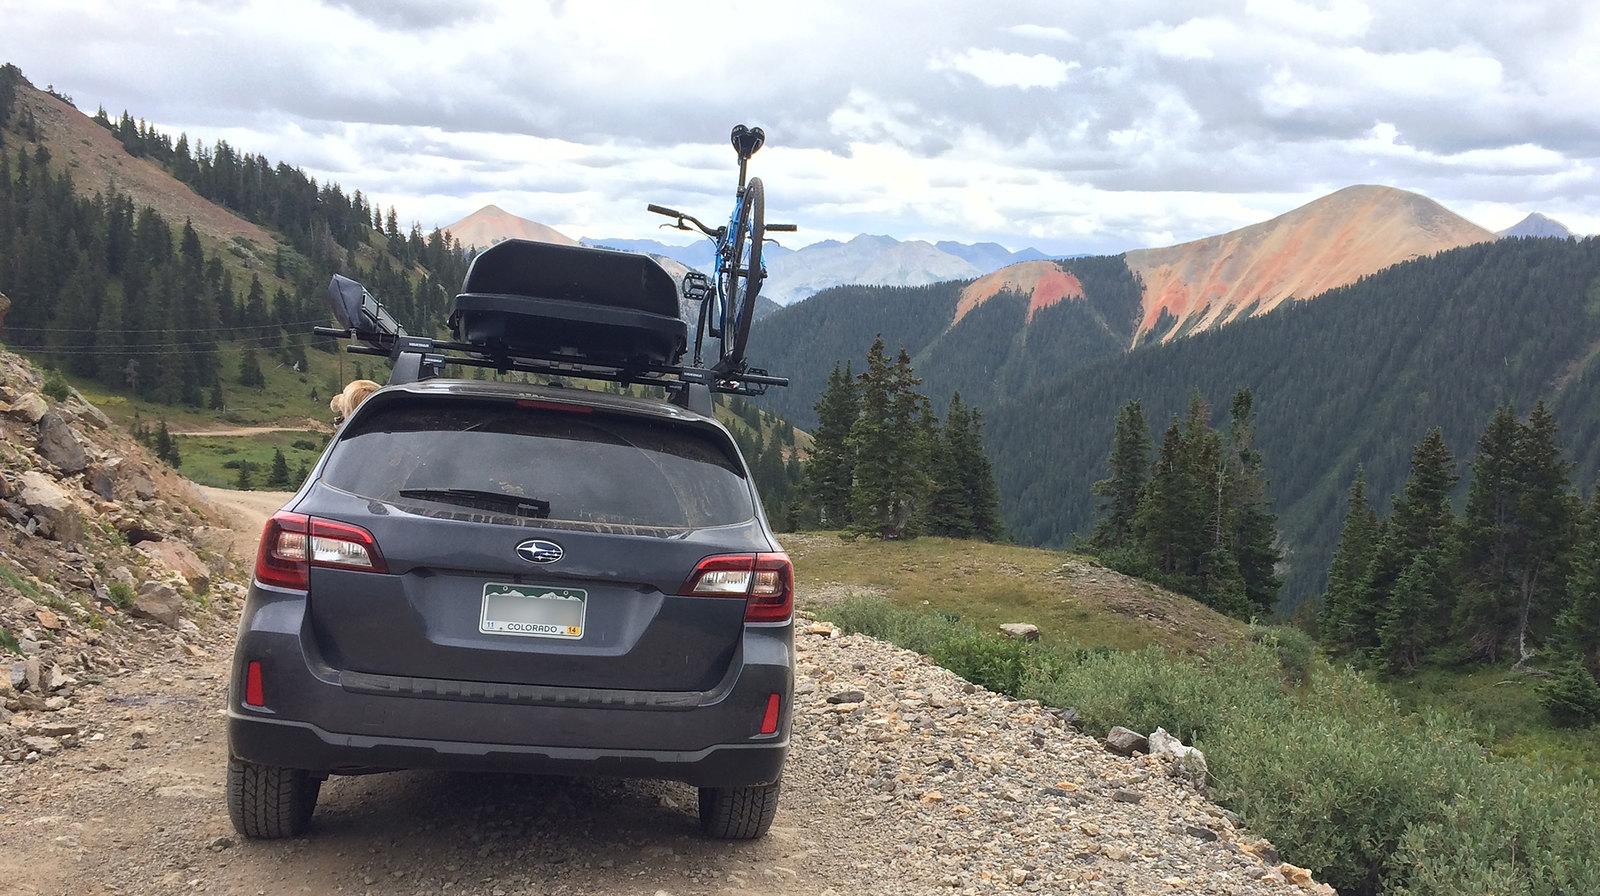 2015 Outback Yakima Crossbars Subaru Outback Subaru